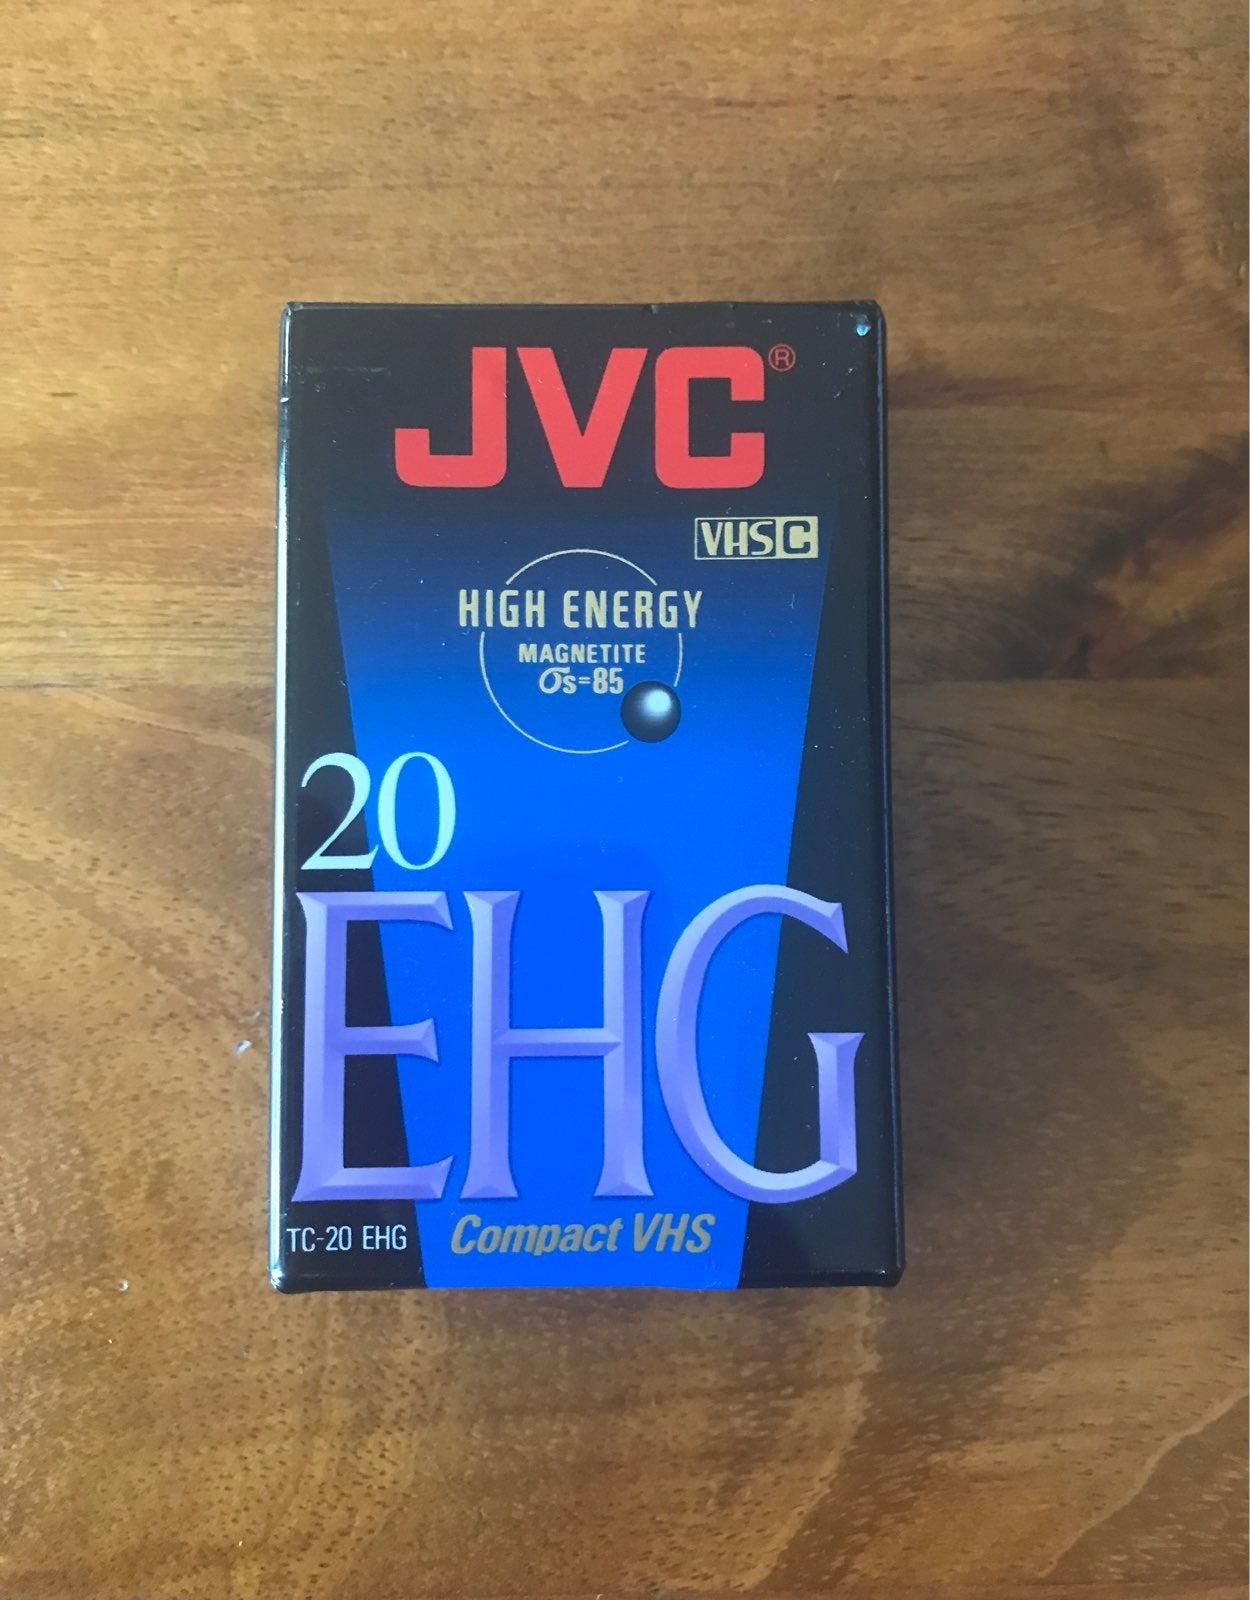 JVC compact VHS tape